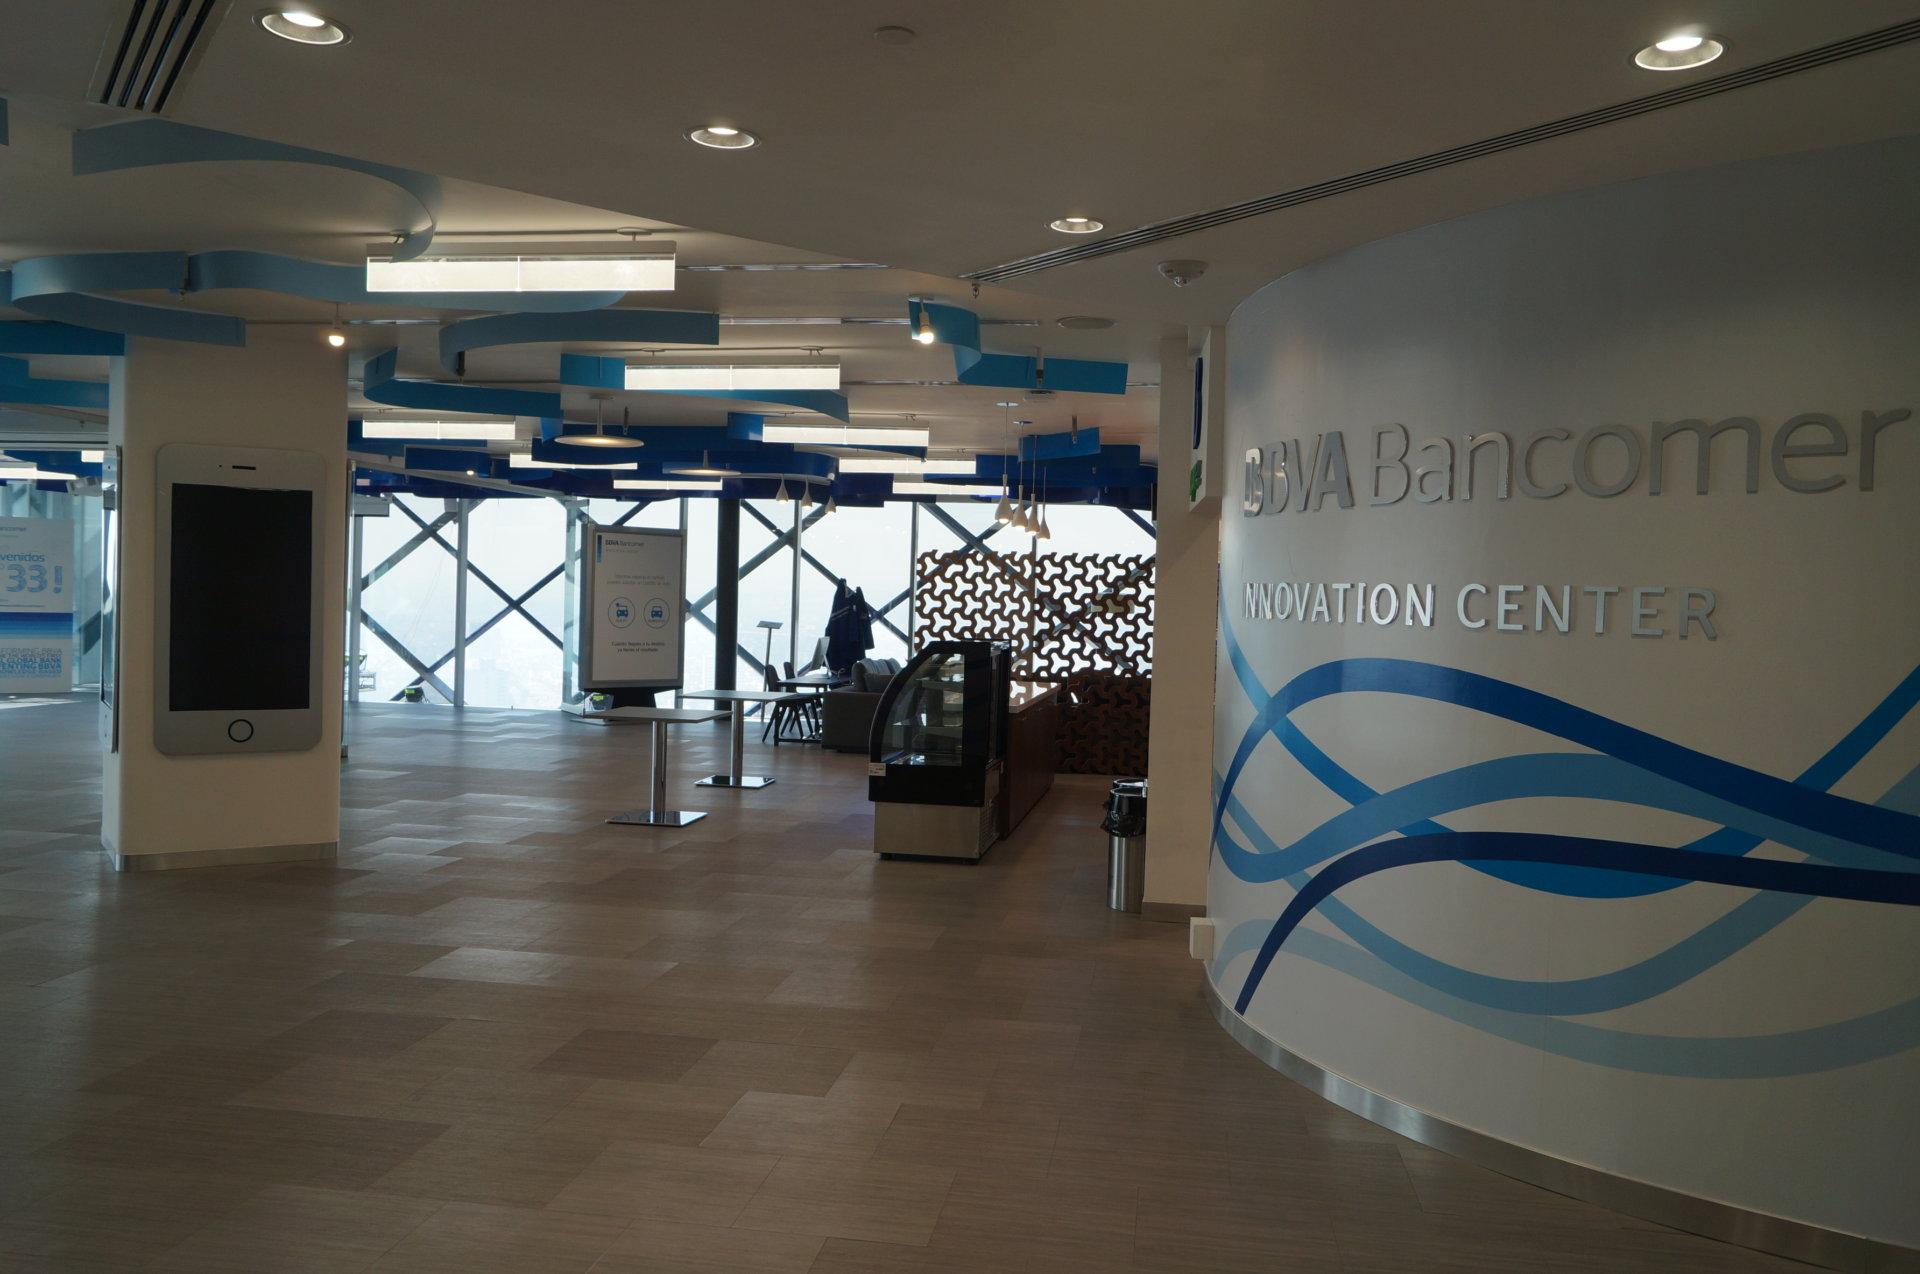 Bbva bbva bancomer presenta su centro de innovaci n for Pisos de bancos bbva